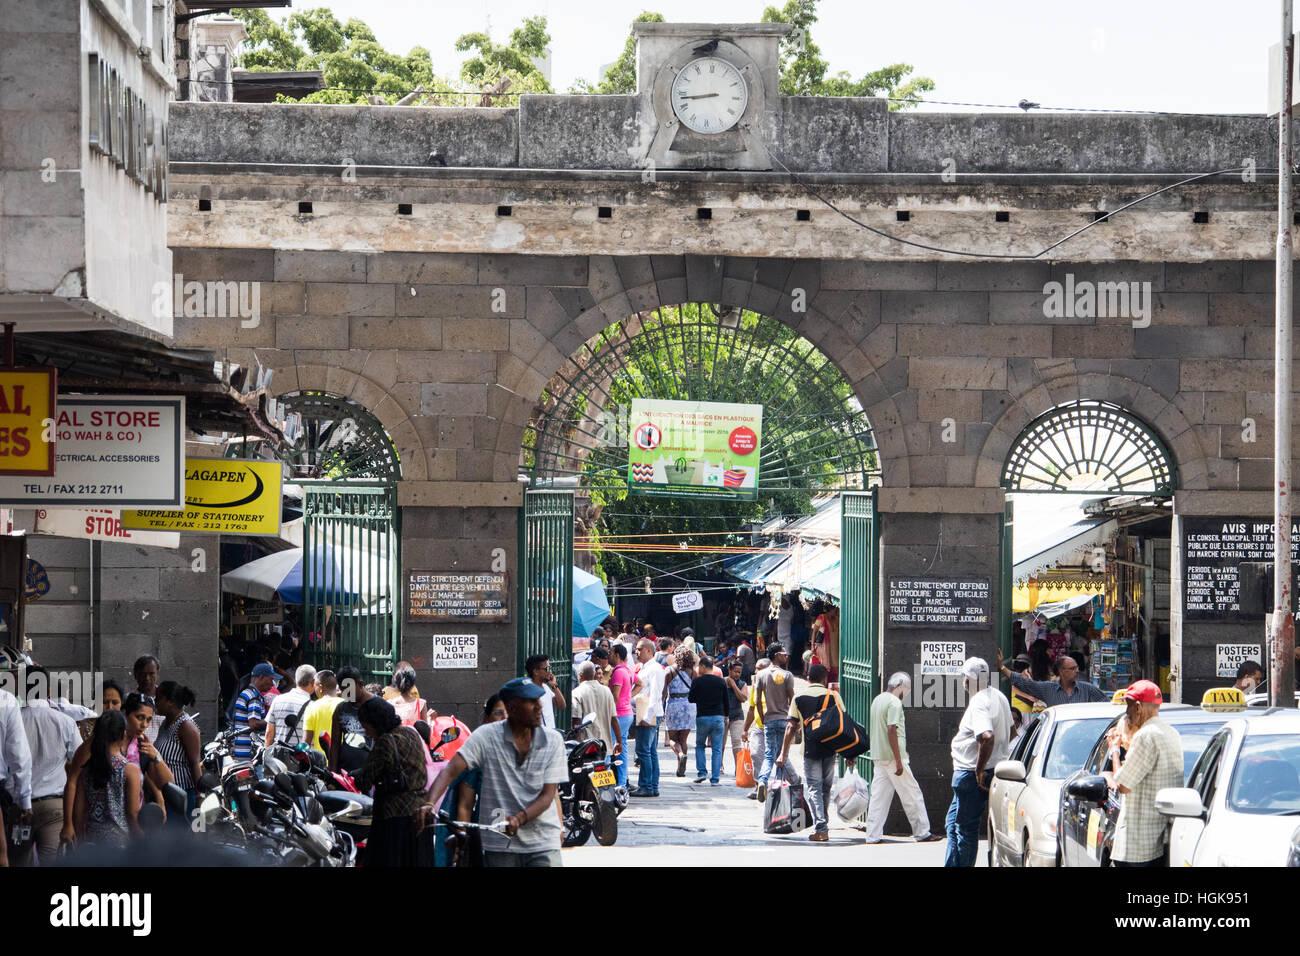 Central market port louis mauritius stock photo royalty free image 130731357 alamy - Mauritius market port louis ...